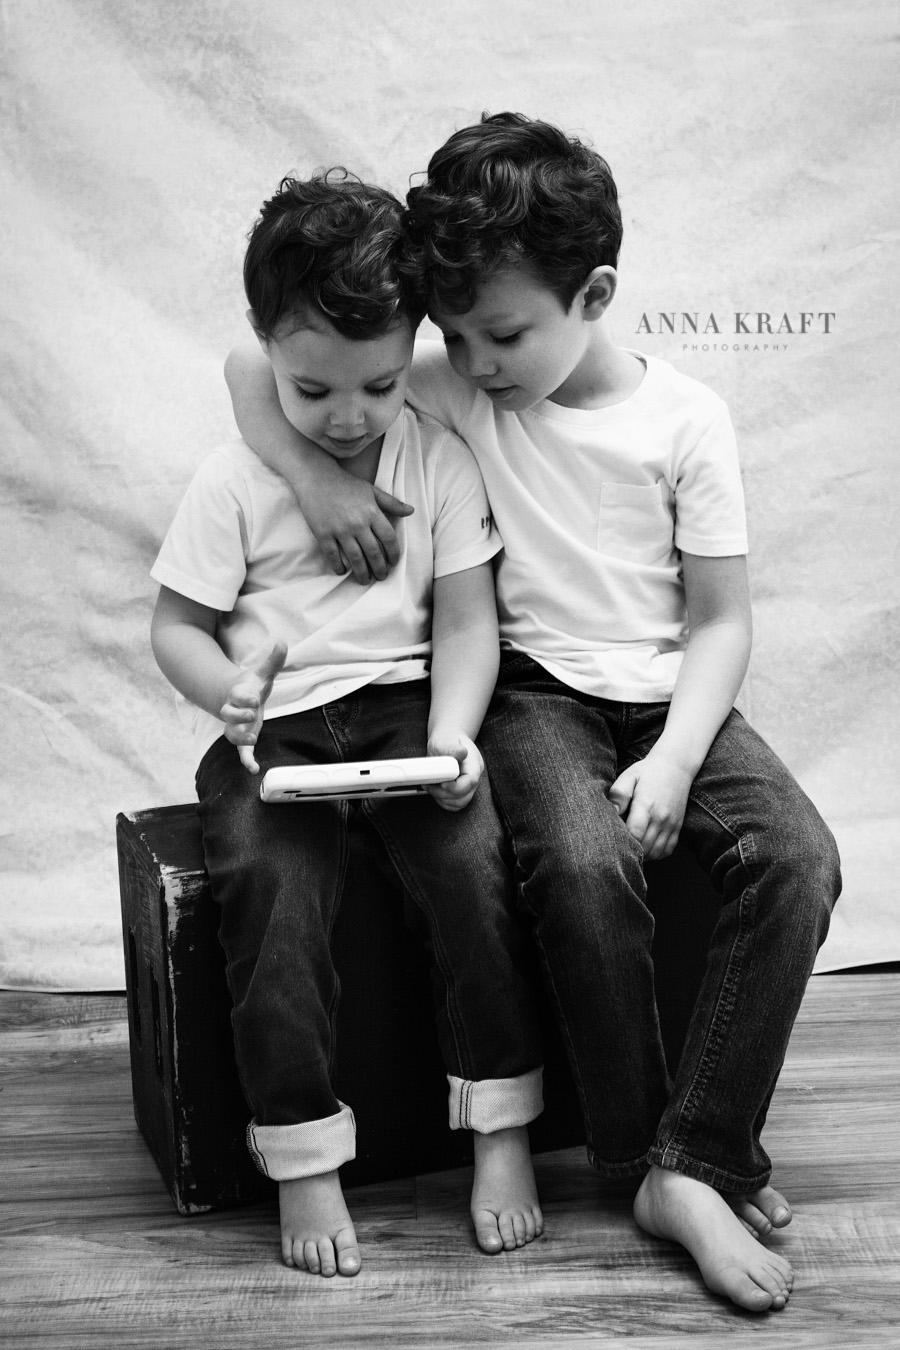 anna_kraft_photography_georgetown_square_studio_family_portrait-7.jpg